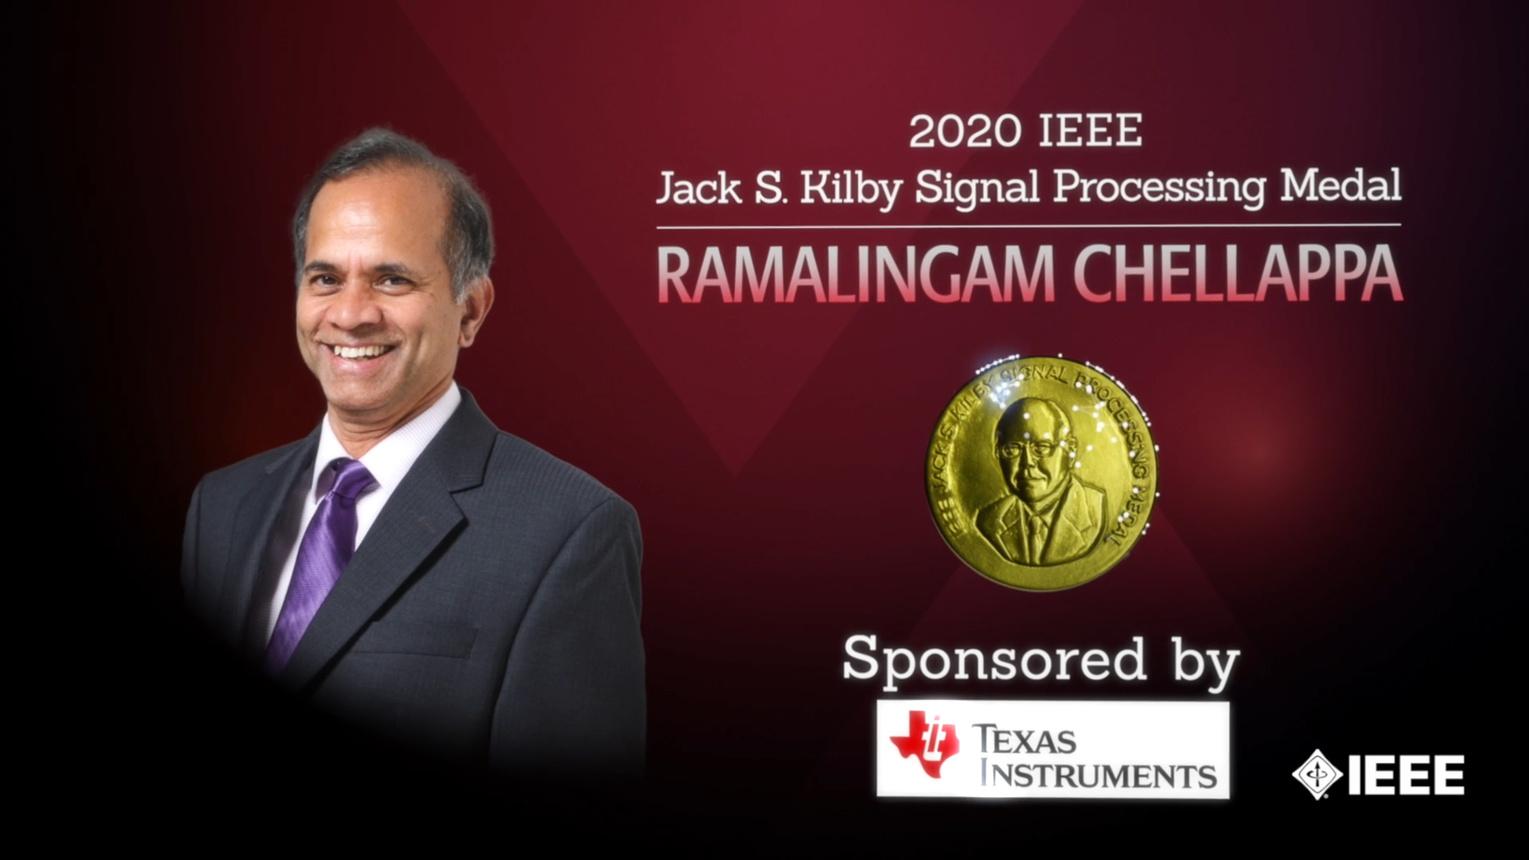 Honors 2020: Ramalingam Chellappa Wins the Jack S. Kilby Signal Processing Medal